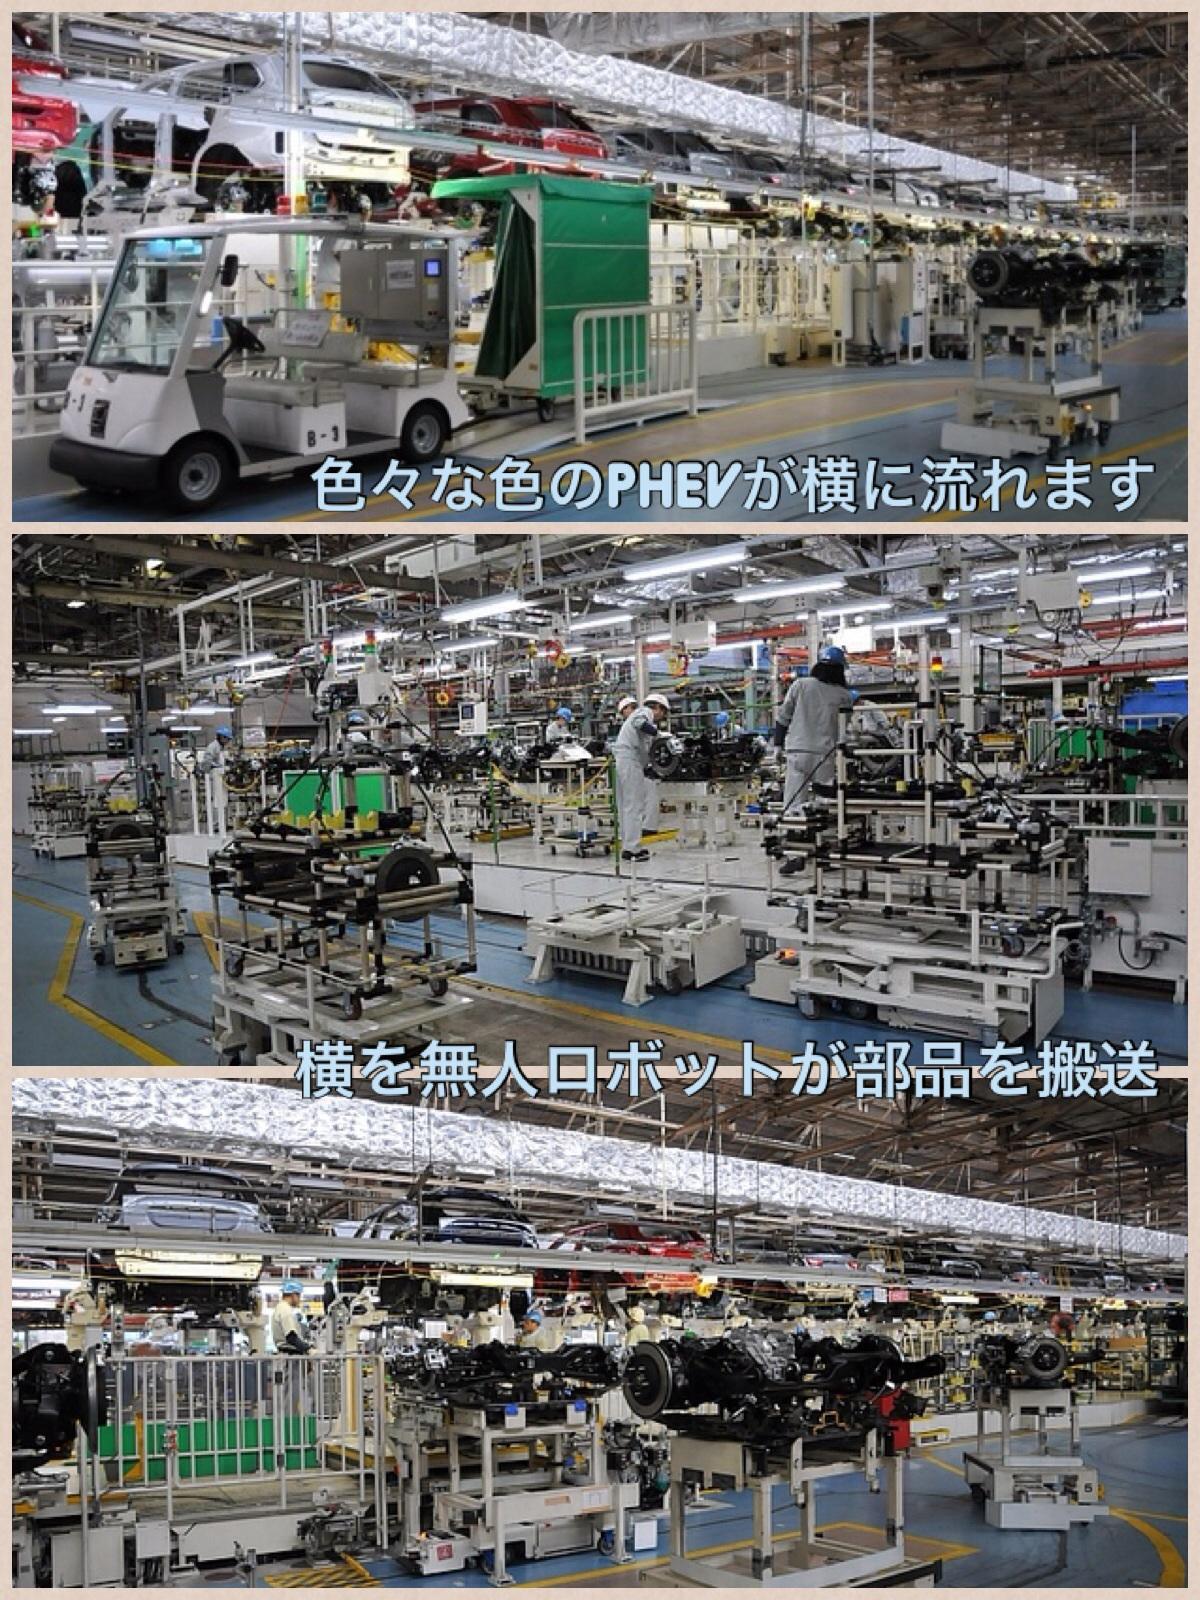 Outlander phev factory アウトランダー工場